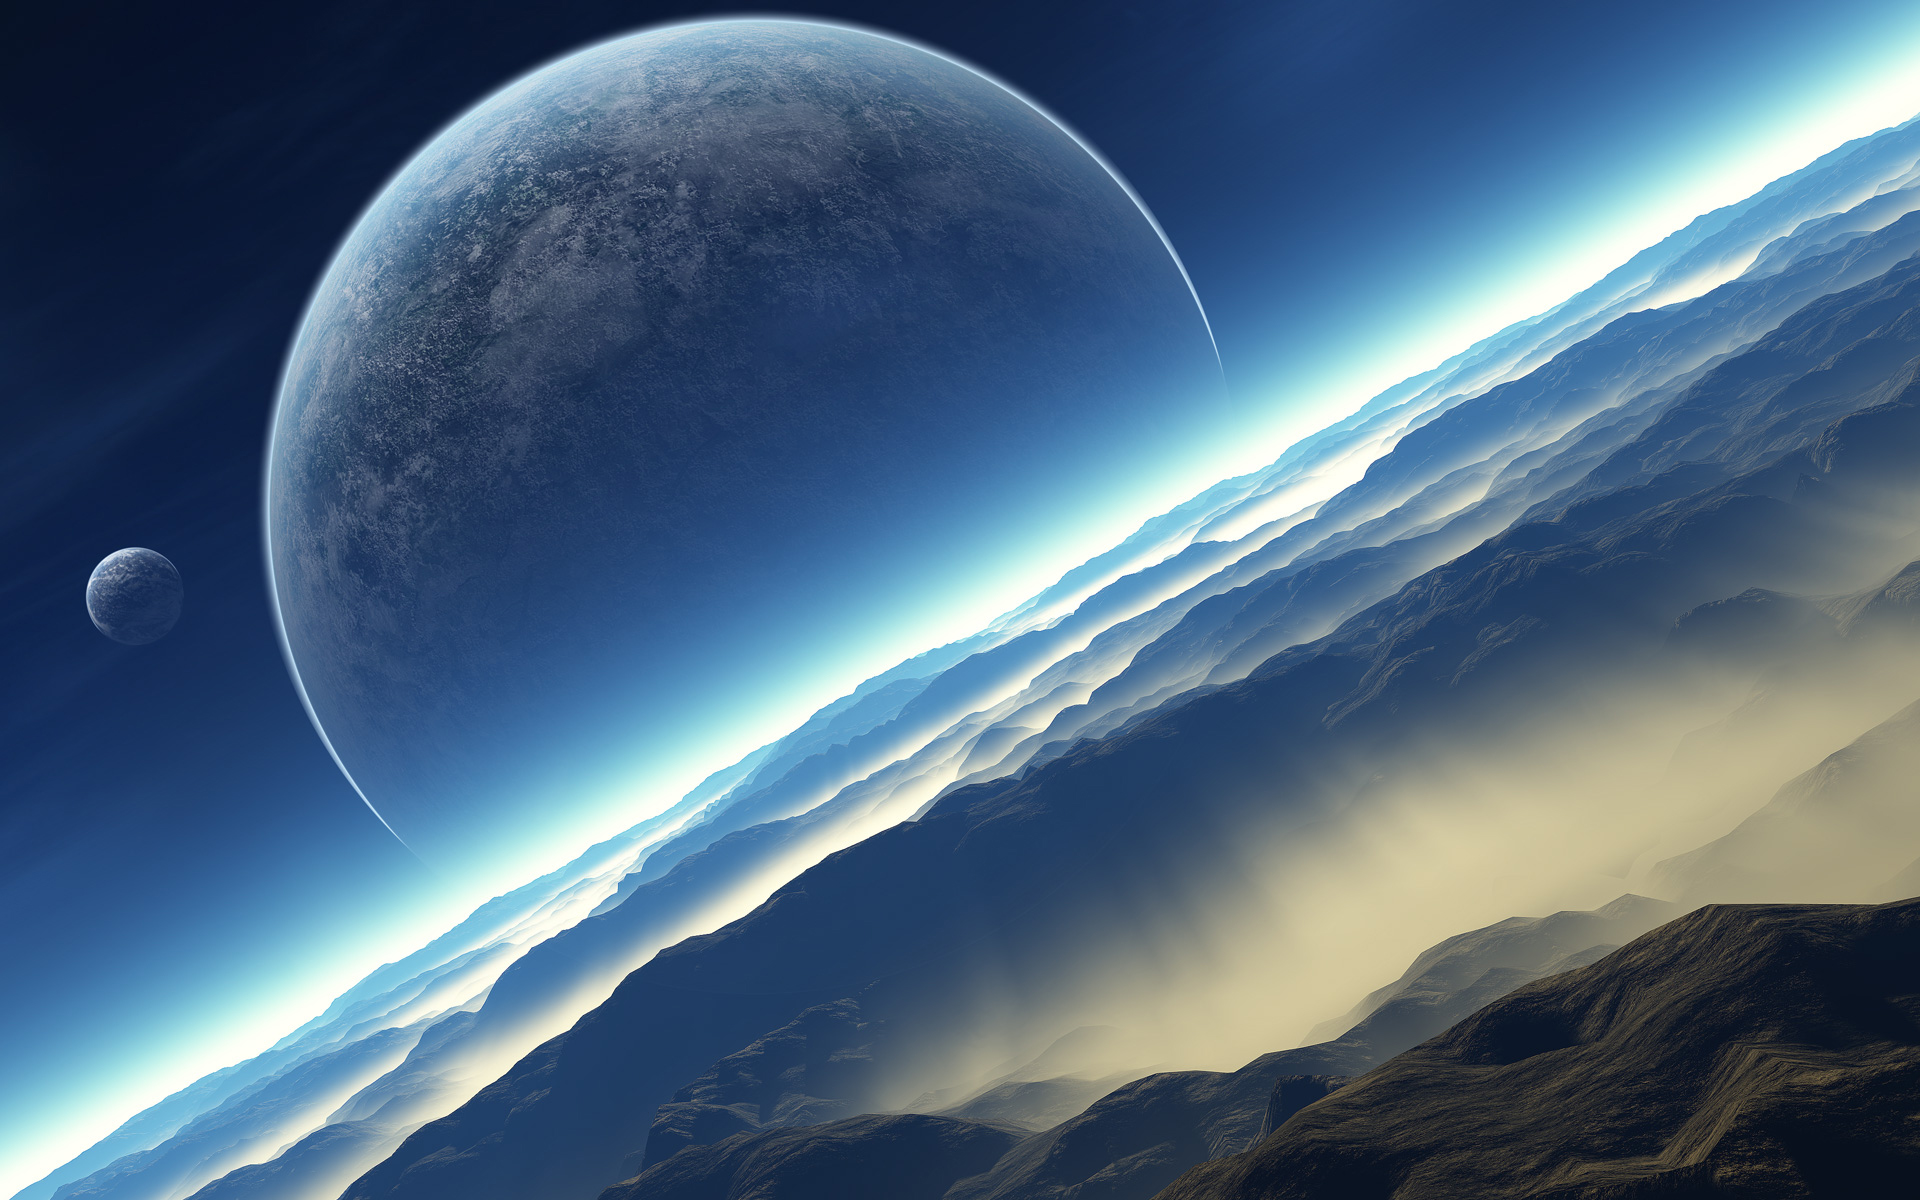 3D Space Scene Res: 1920x1200 / Size:837kb. Views: 257061